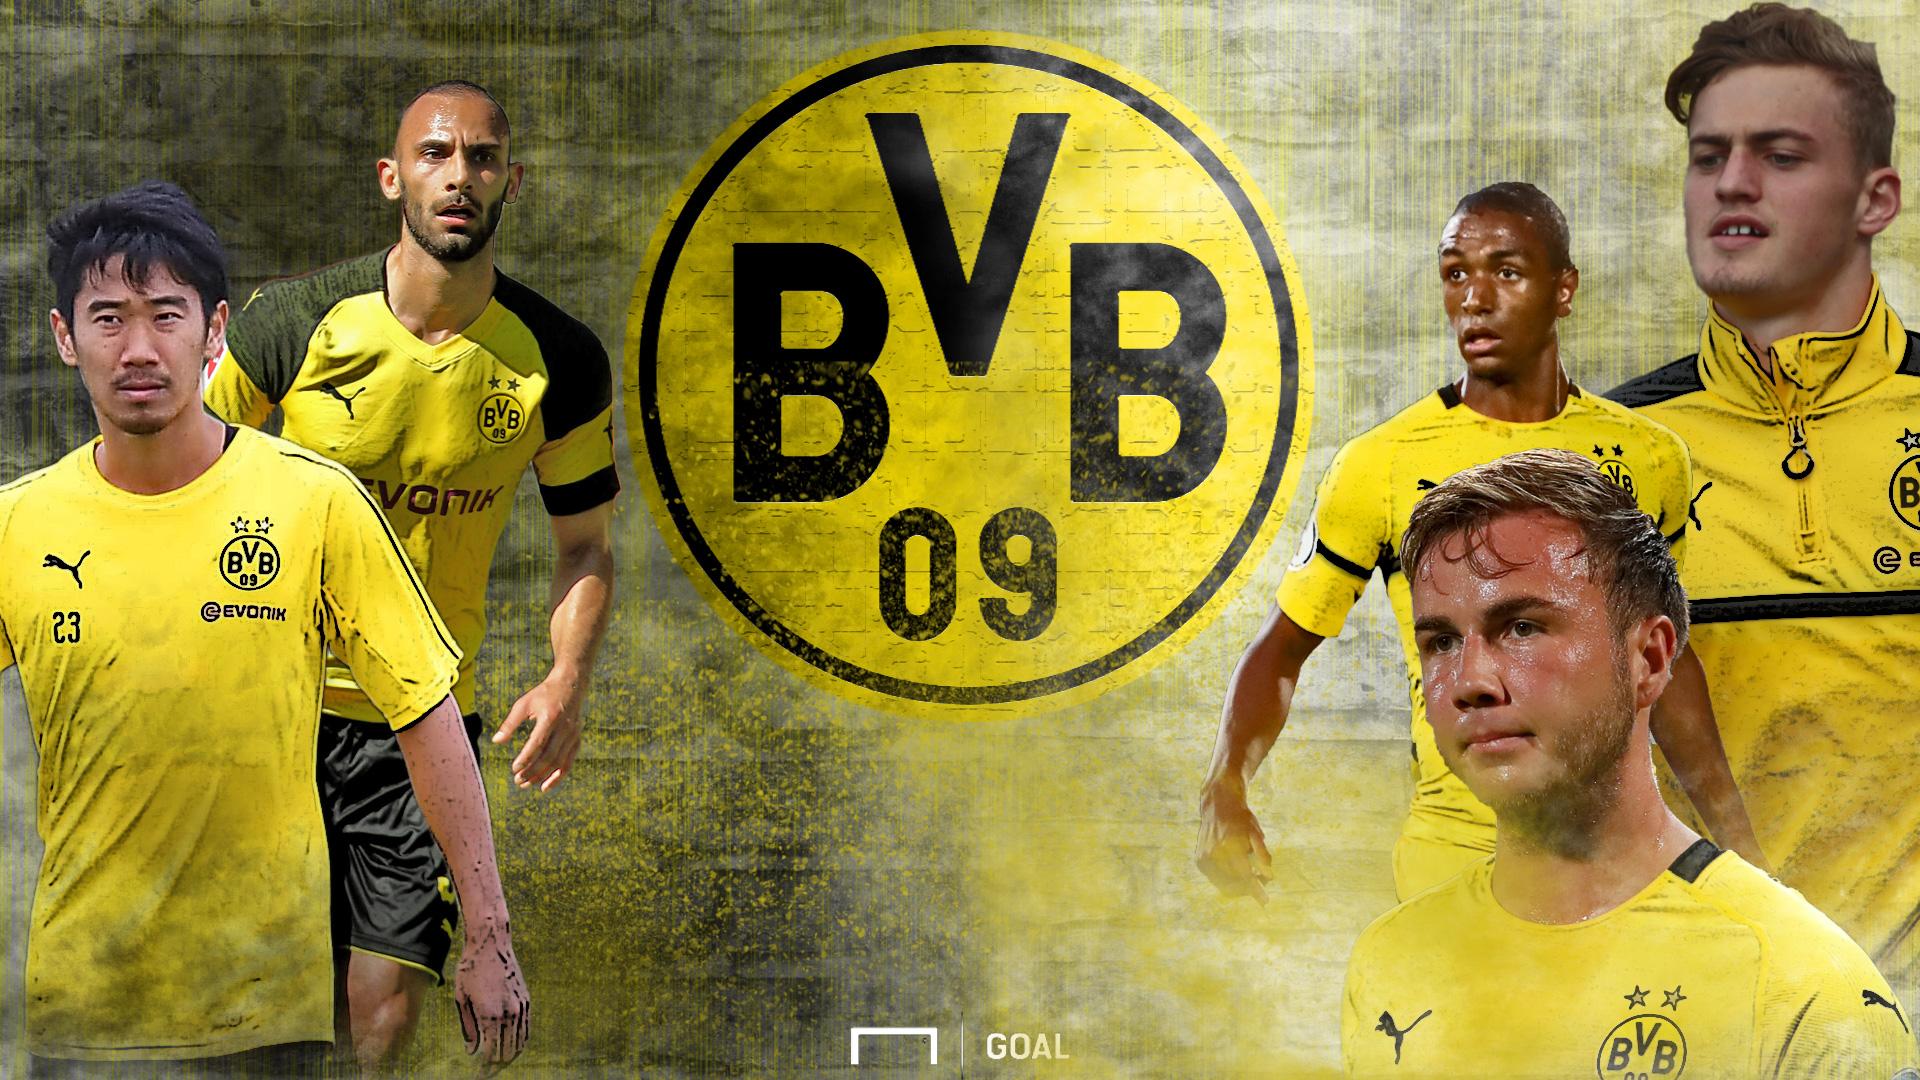 GFX BVB Borussia Dortmund Saisonvorbereitung